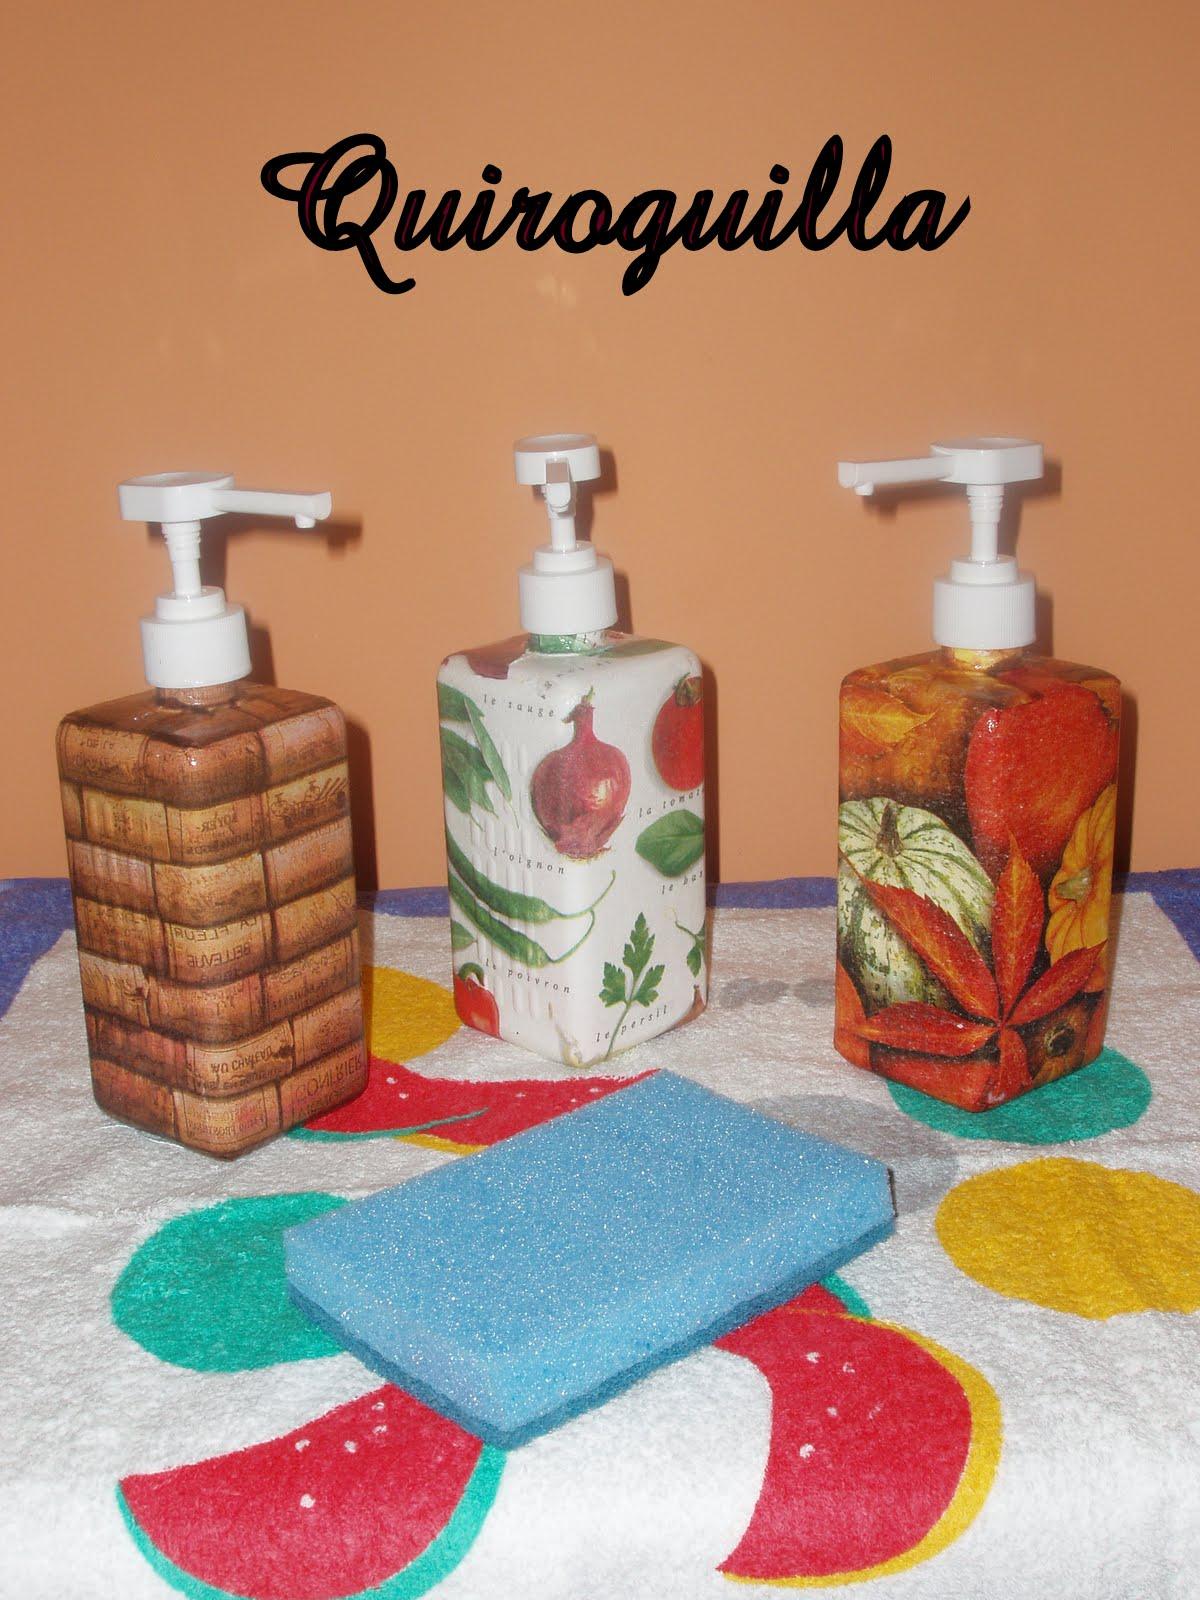 La Quiroguilla de moda: Dispensadores de jabón